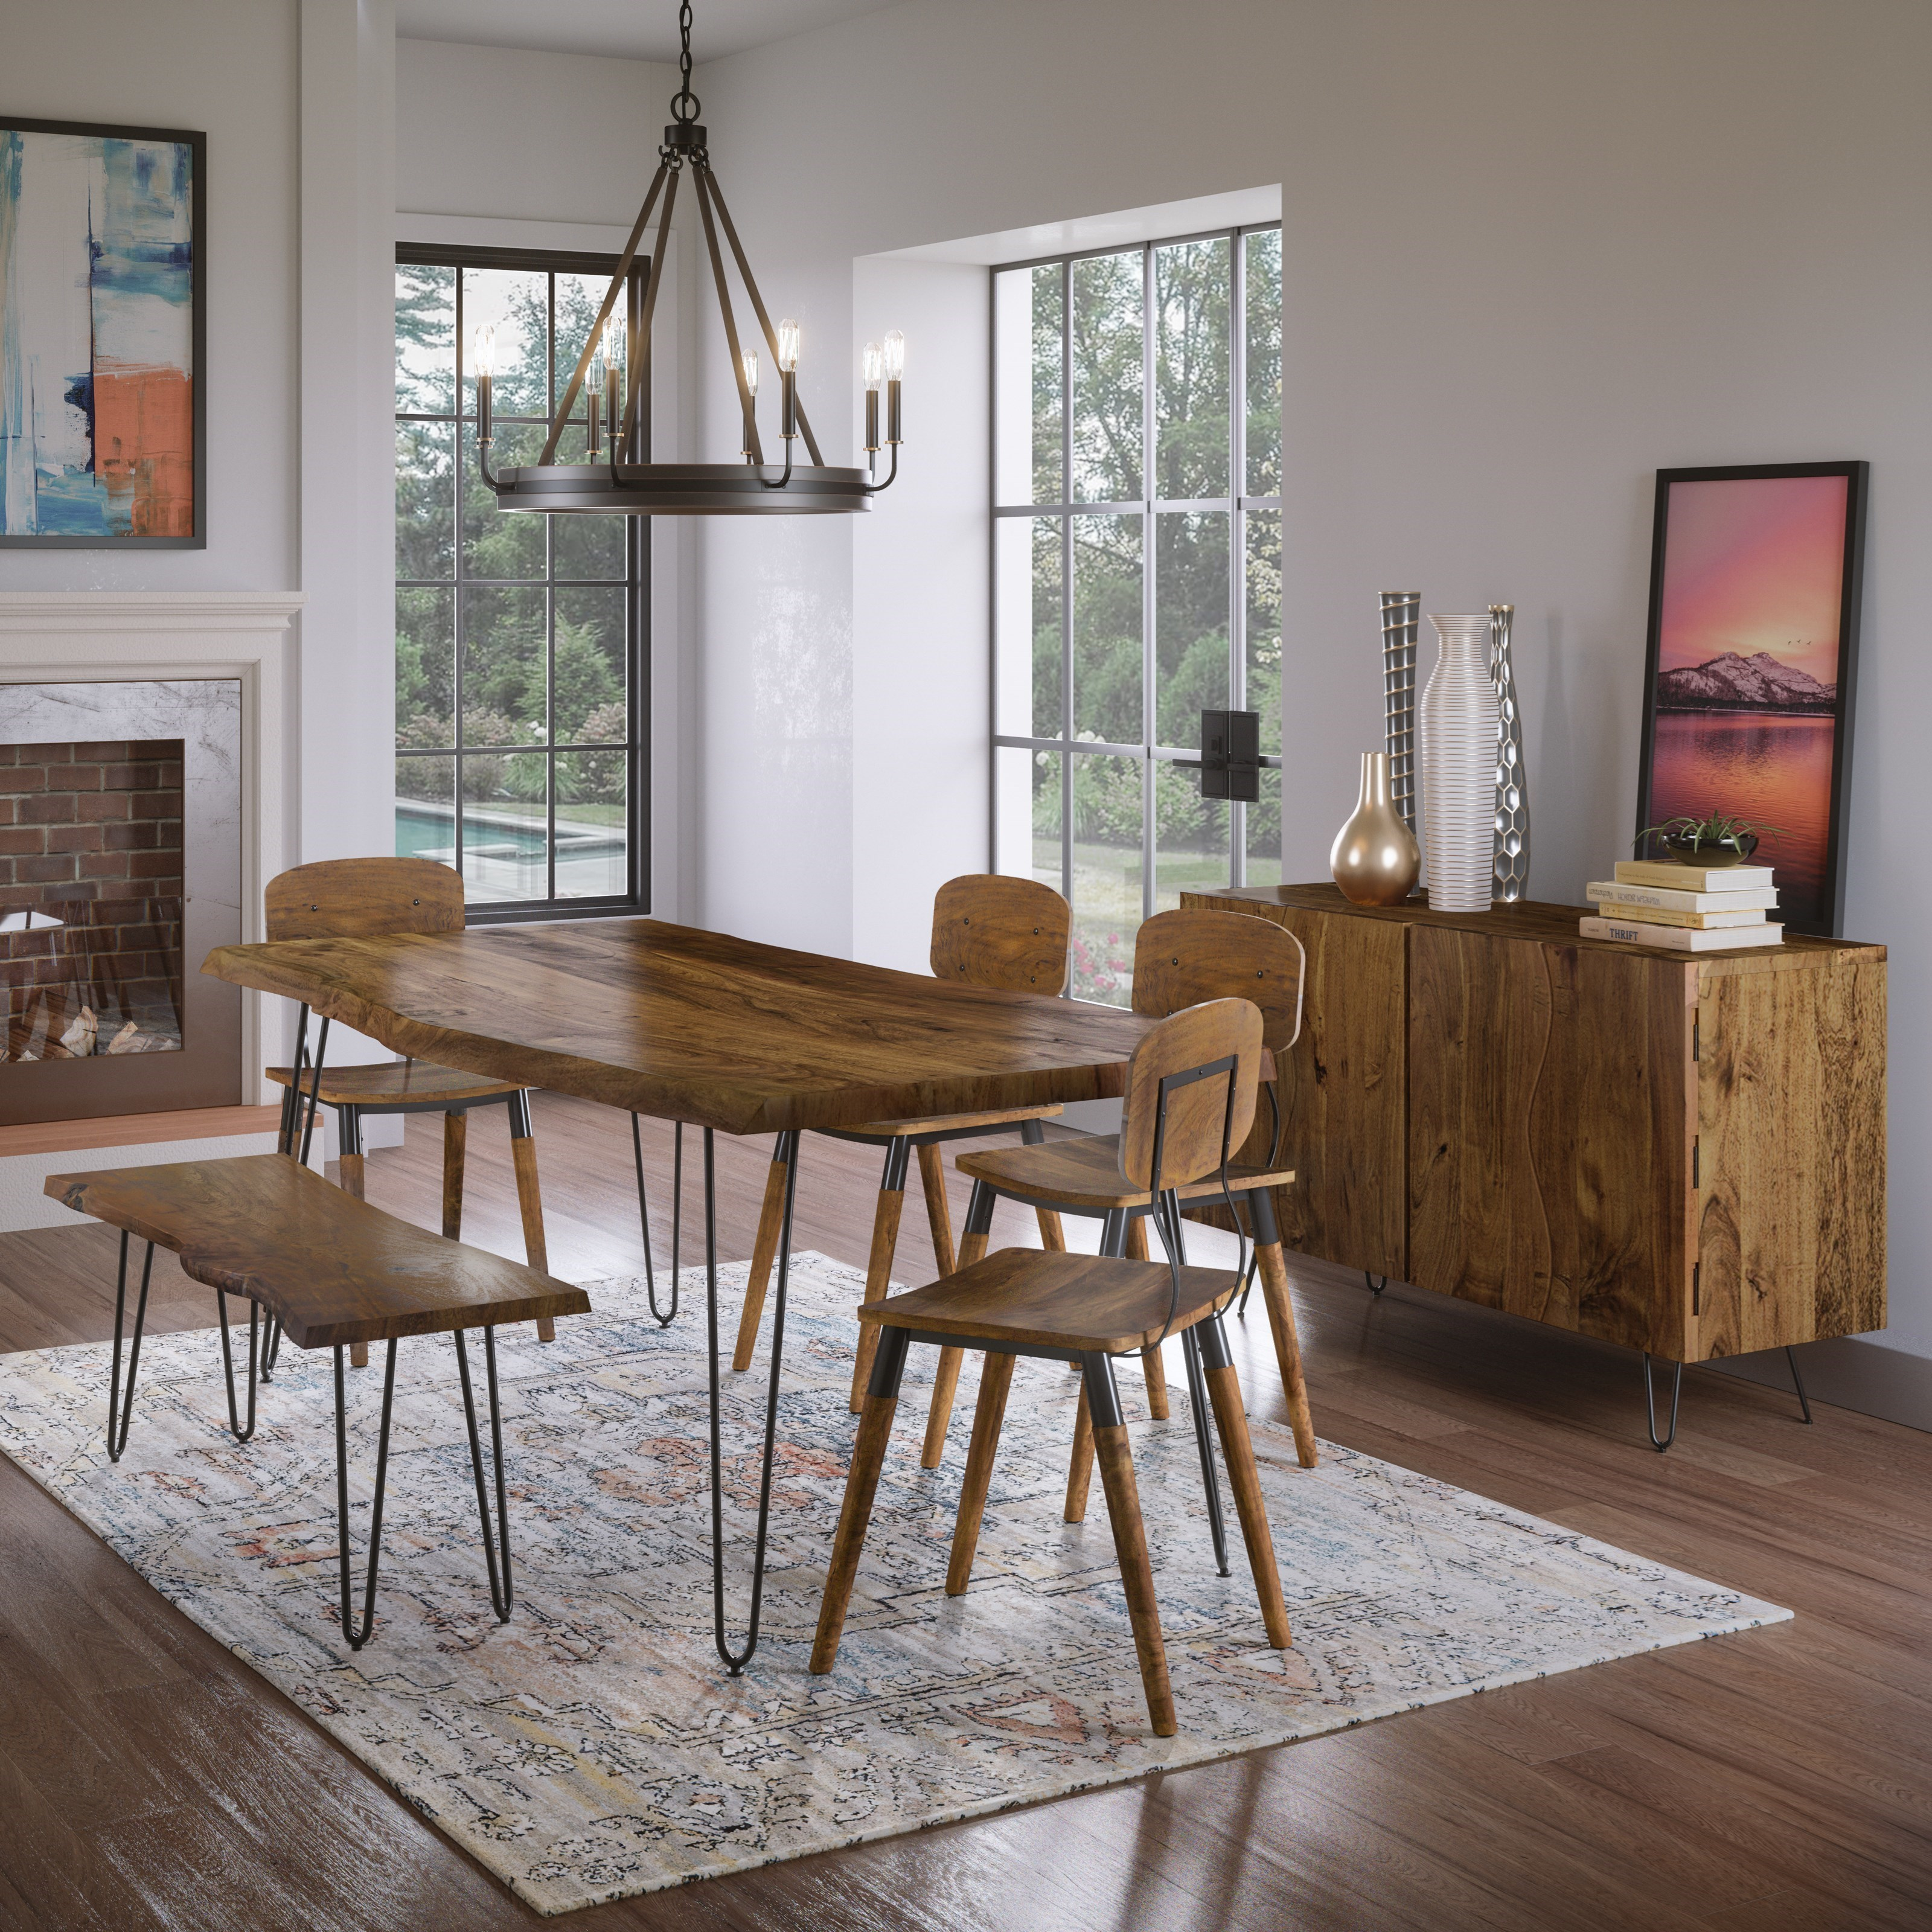 Nature's Edge Dining Room Group by Jofran at Jofran